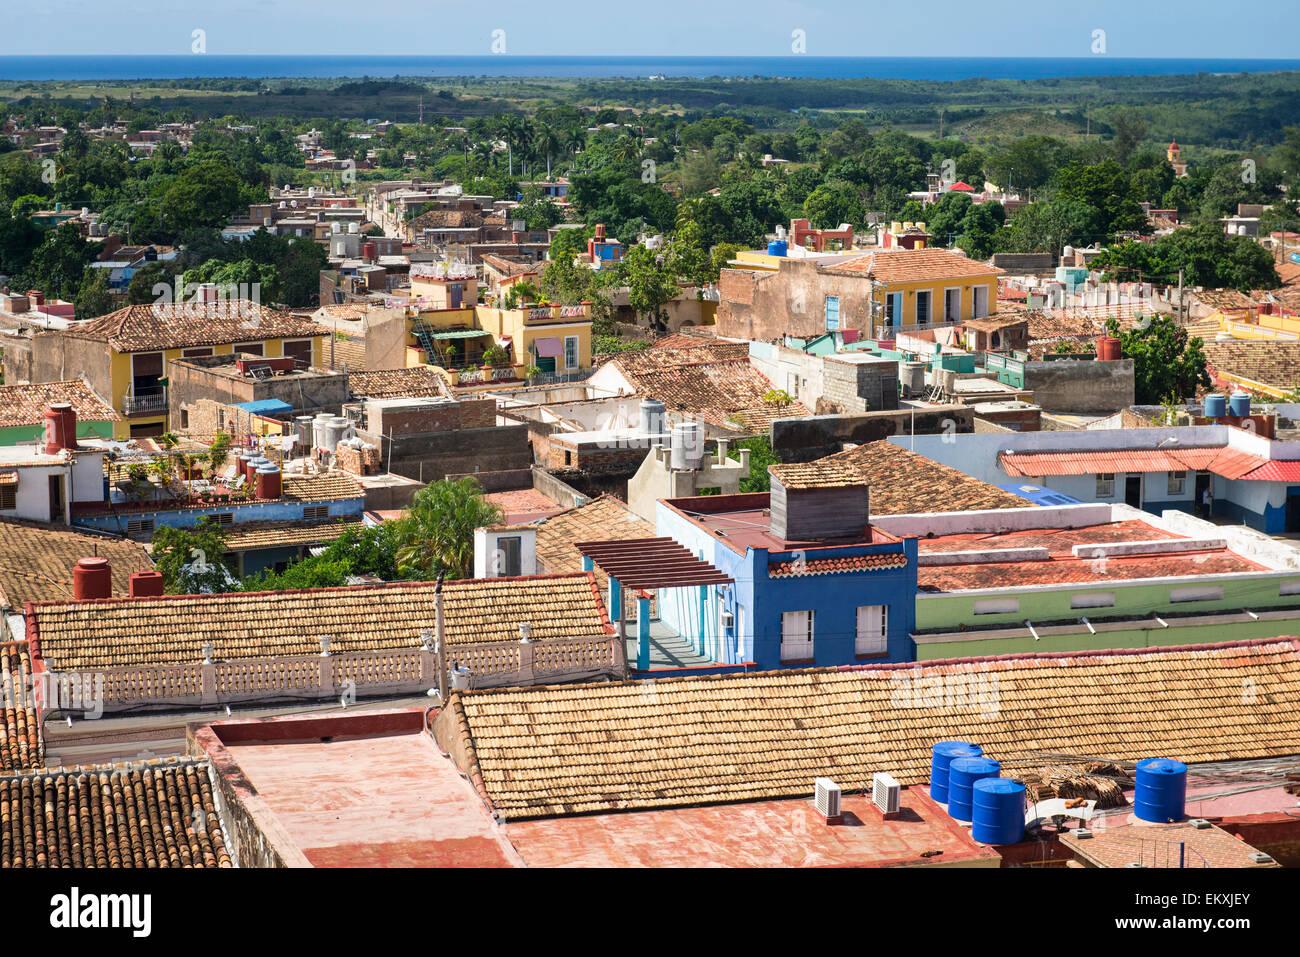 Cuba Trinidad Palacio Cantero Museo Historica Municipal tower over old city town - Stock Image